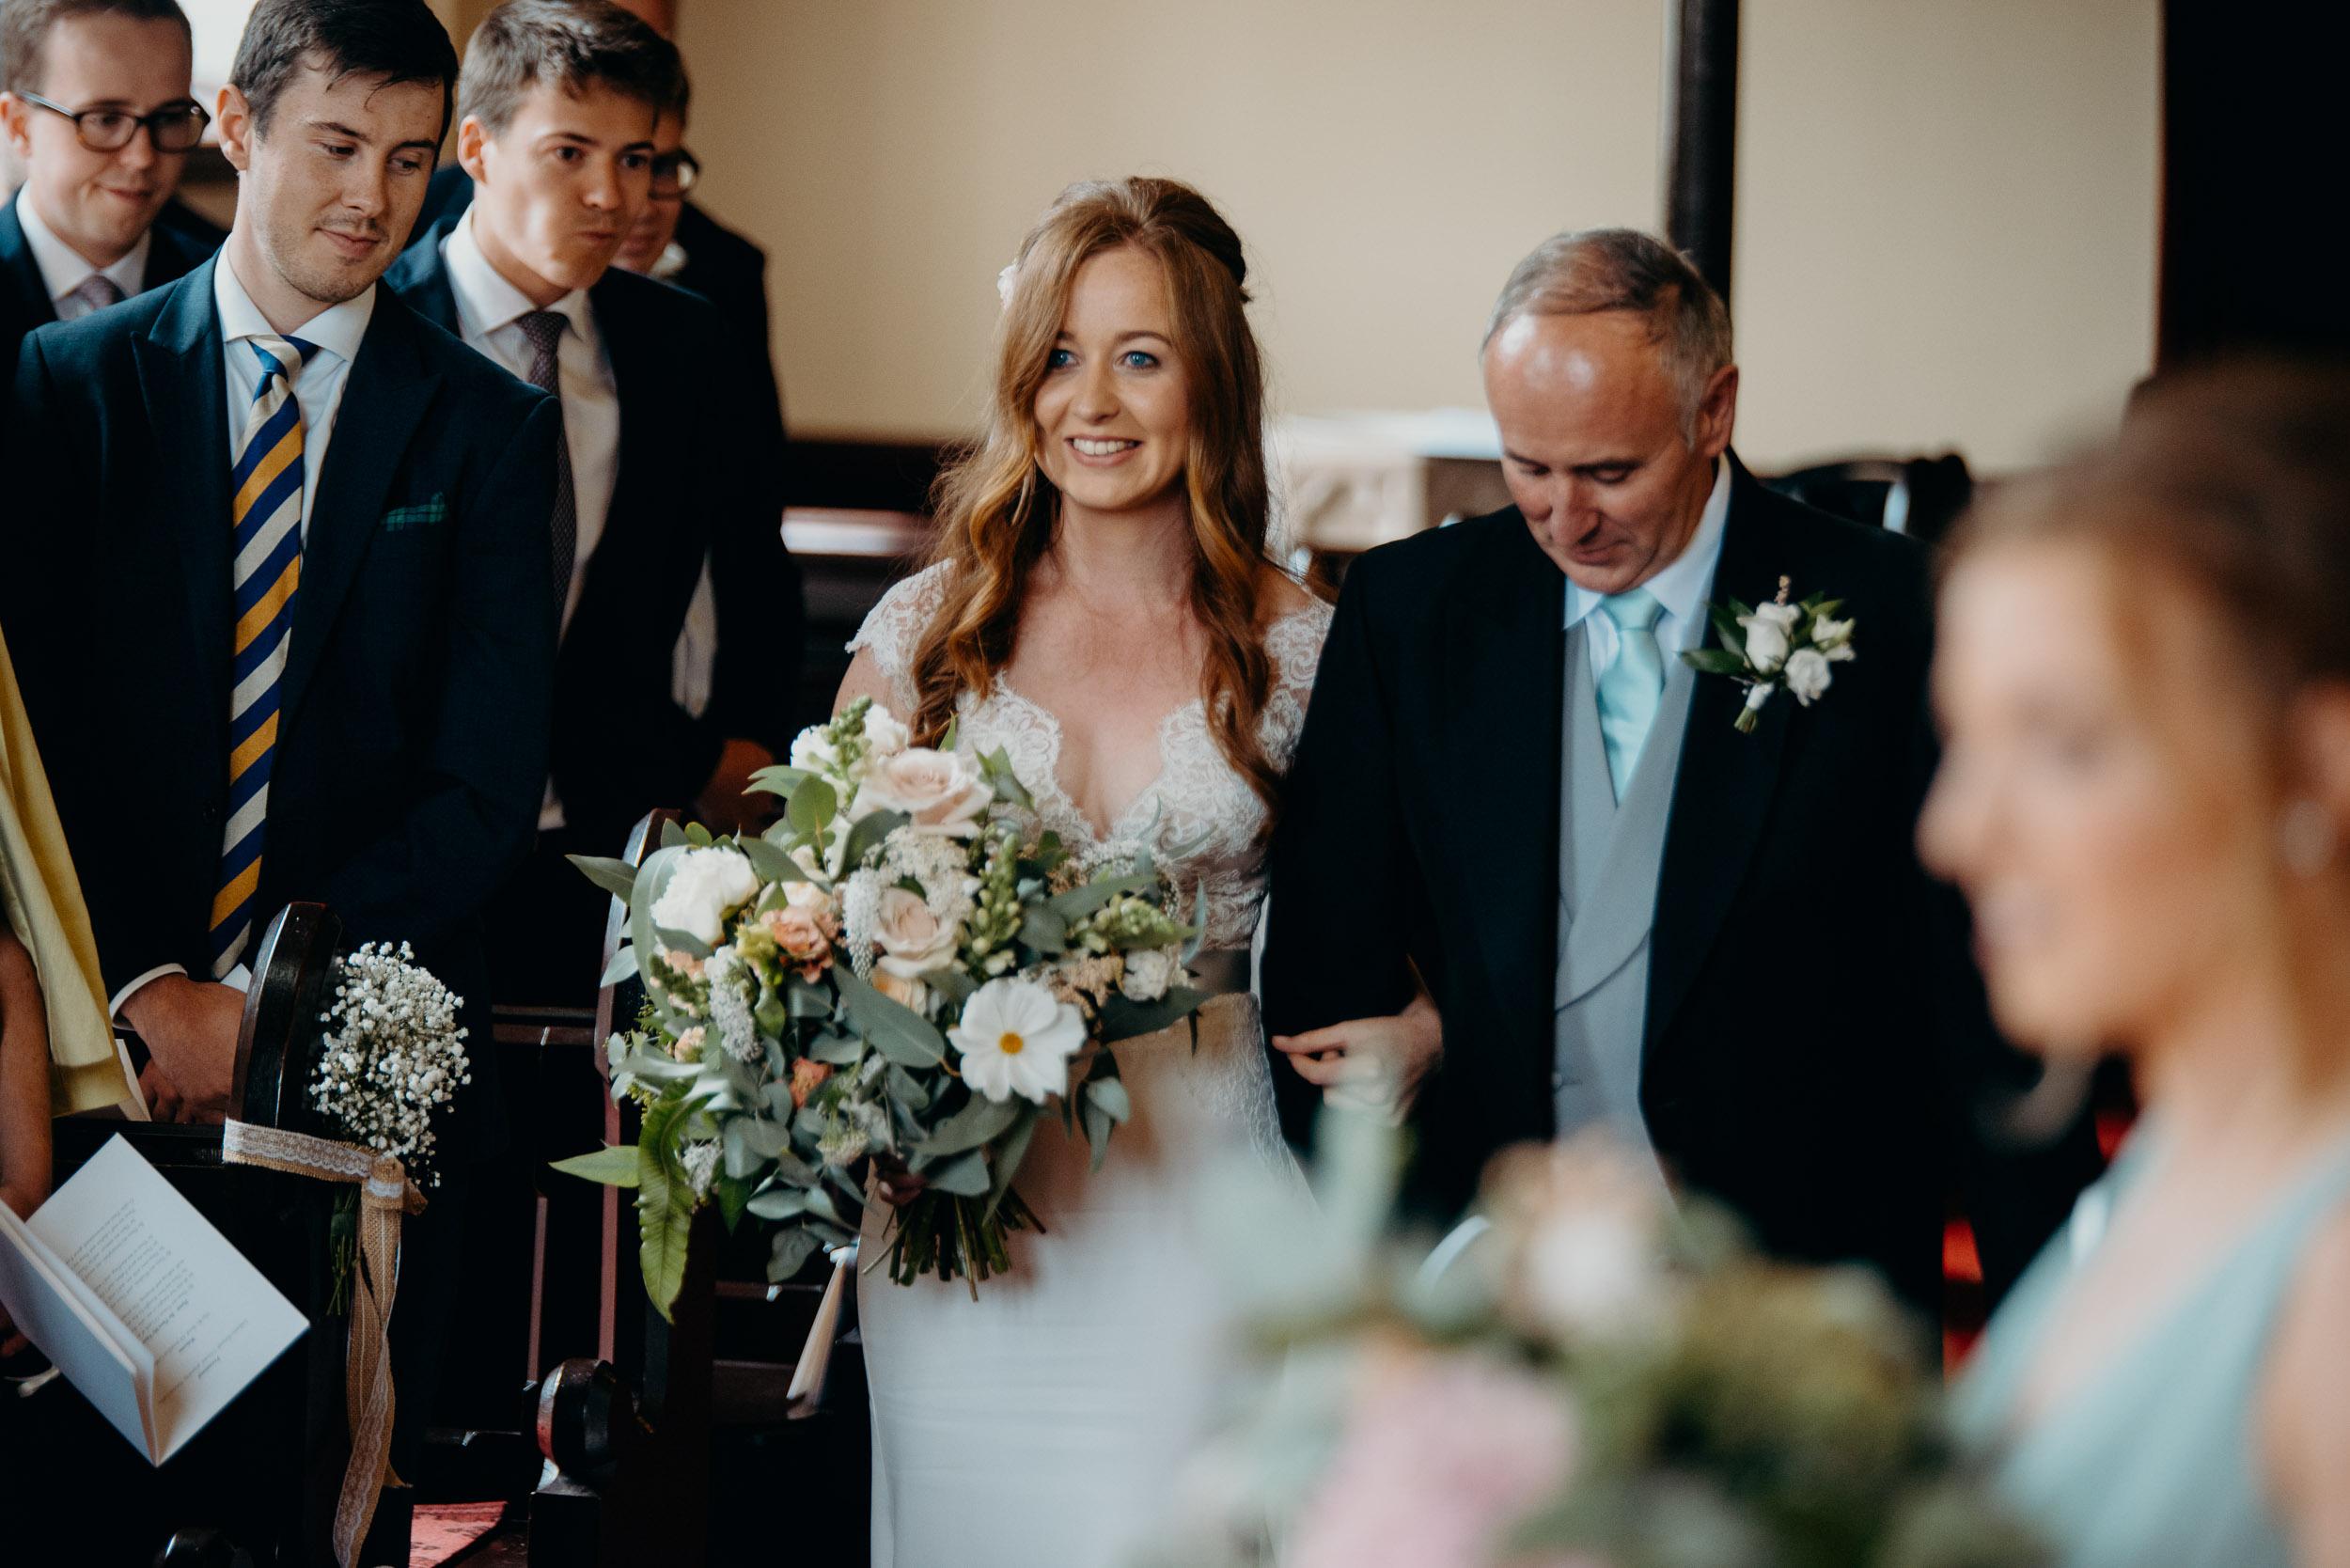 drenagh estate wedding photography-45.jpg